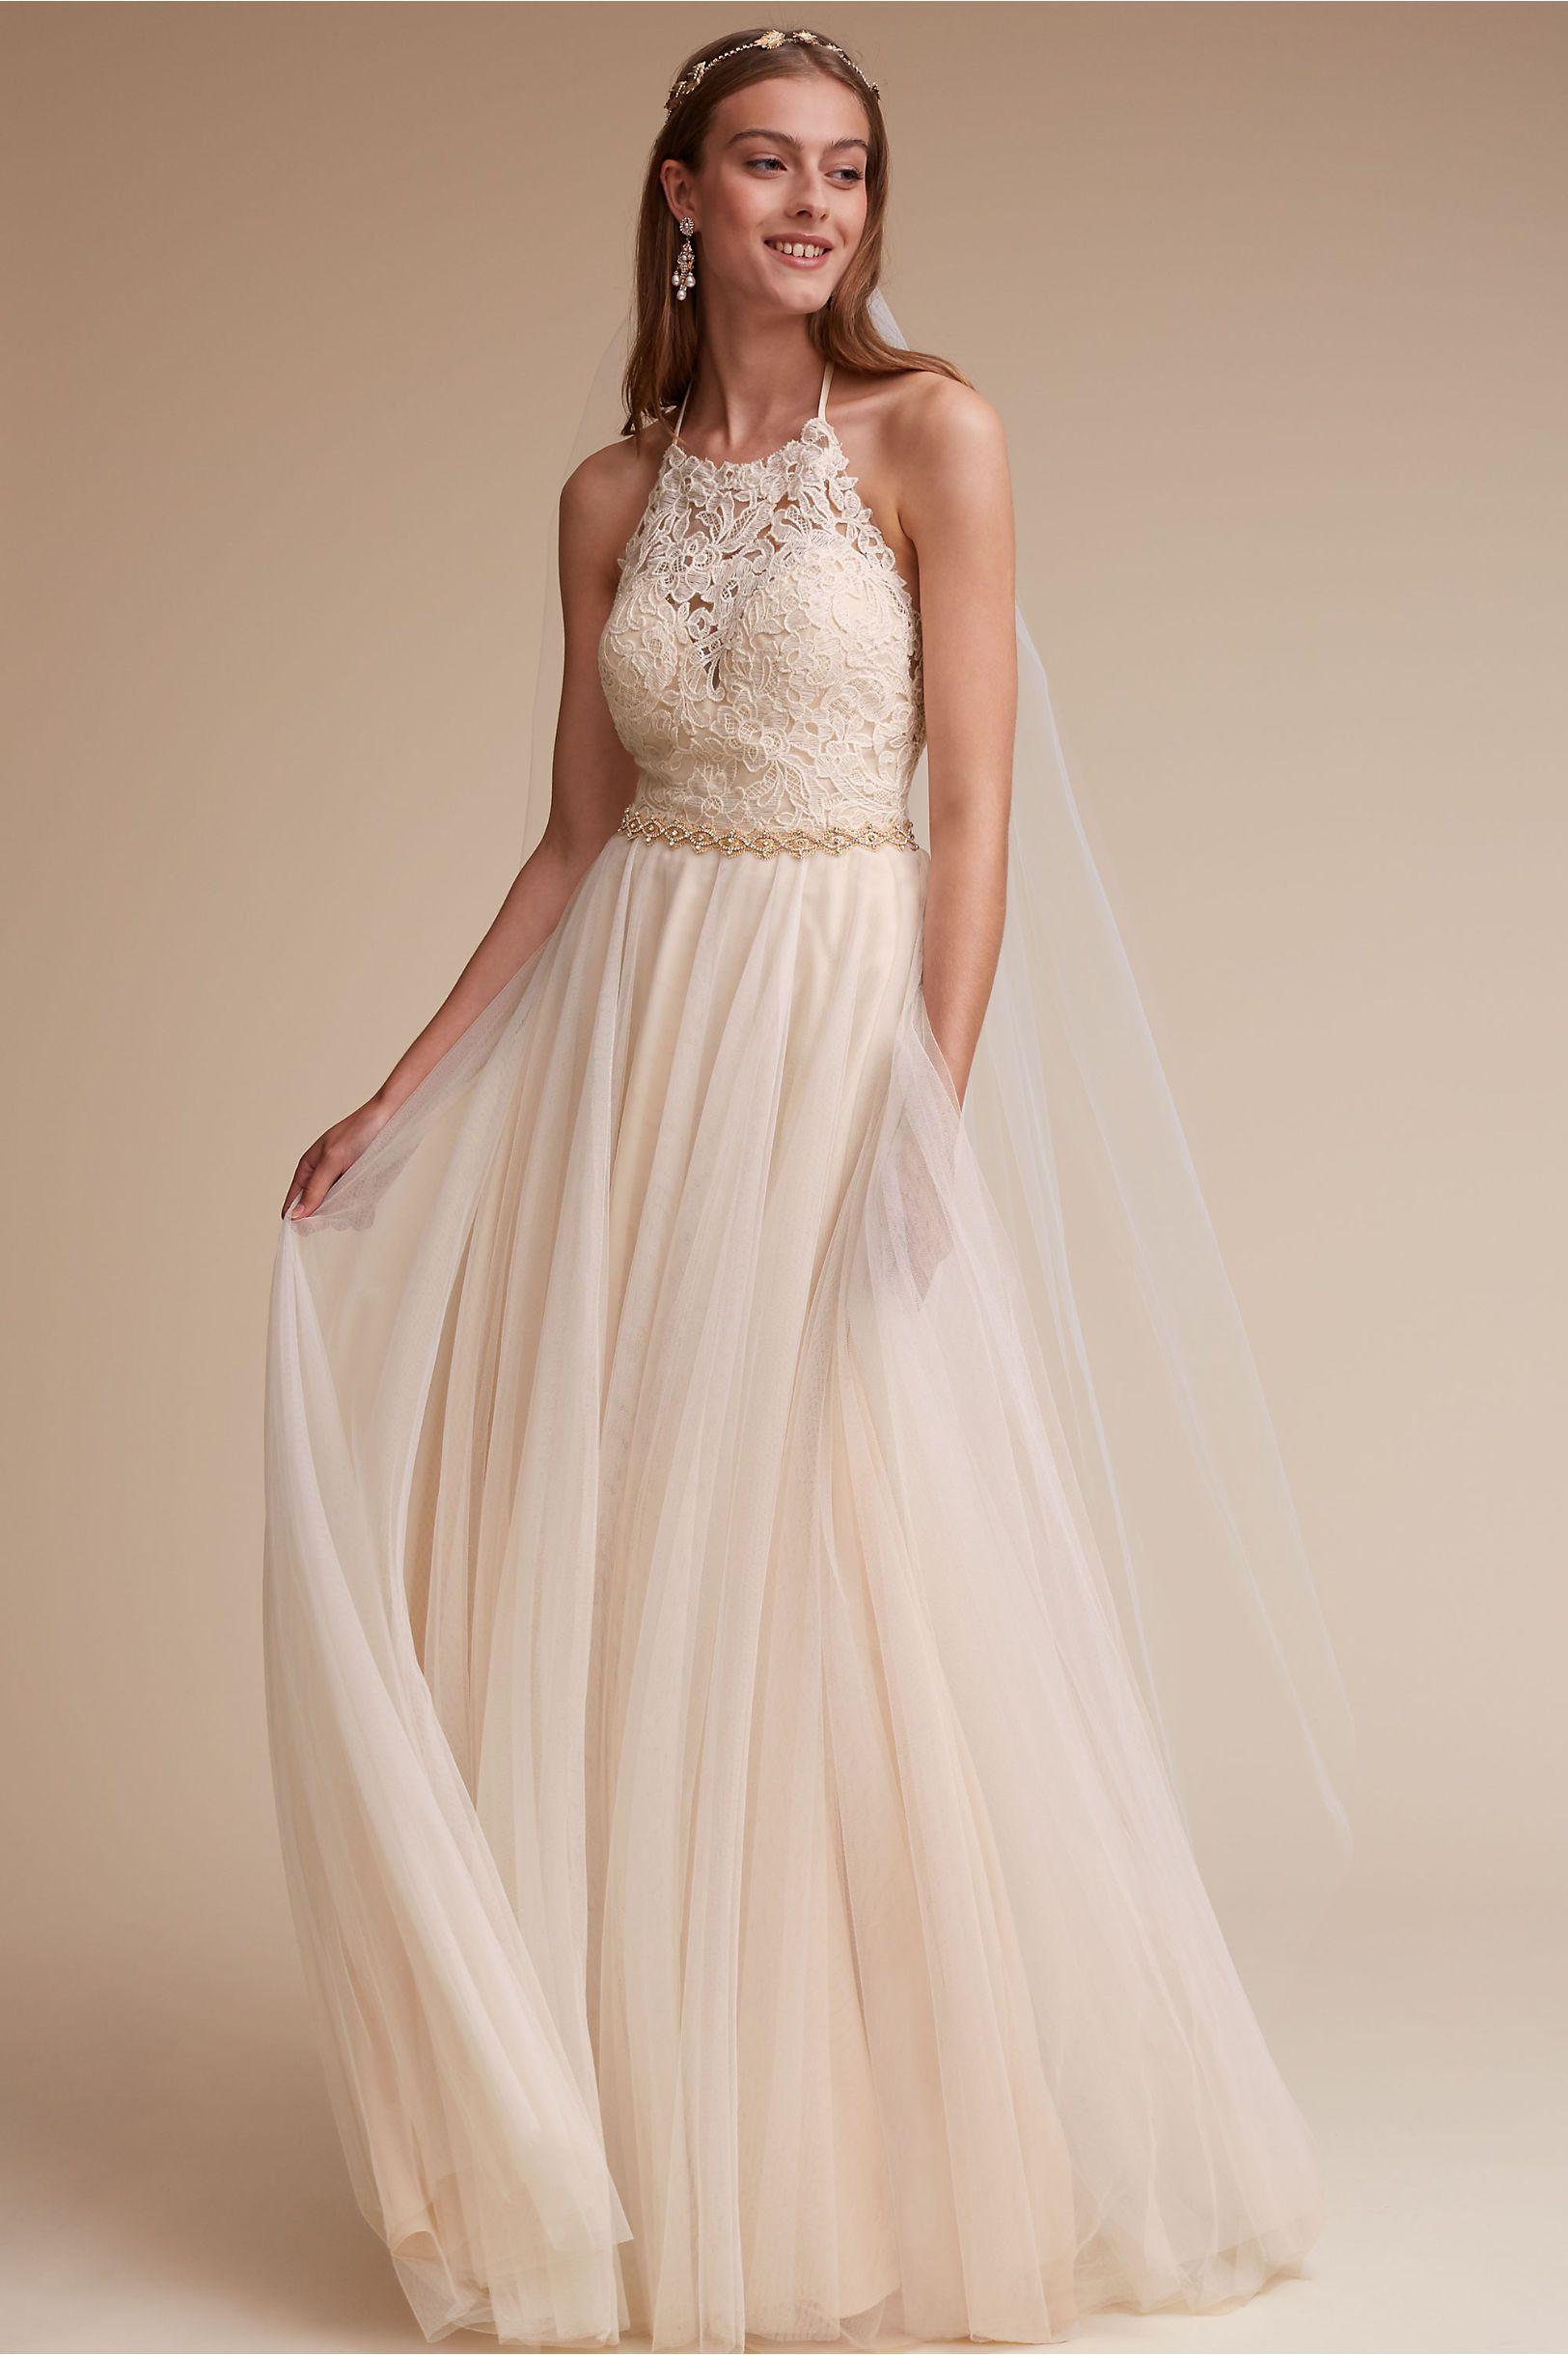 Bhldn S Watters Josie Gown In Ivory Champagne Wedding Dresses Lace A Line Wedding Dress Halter Wedding Dress